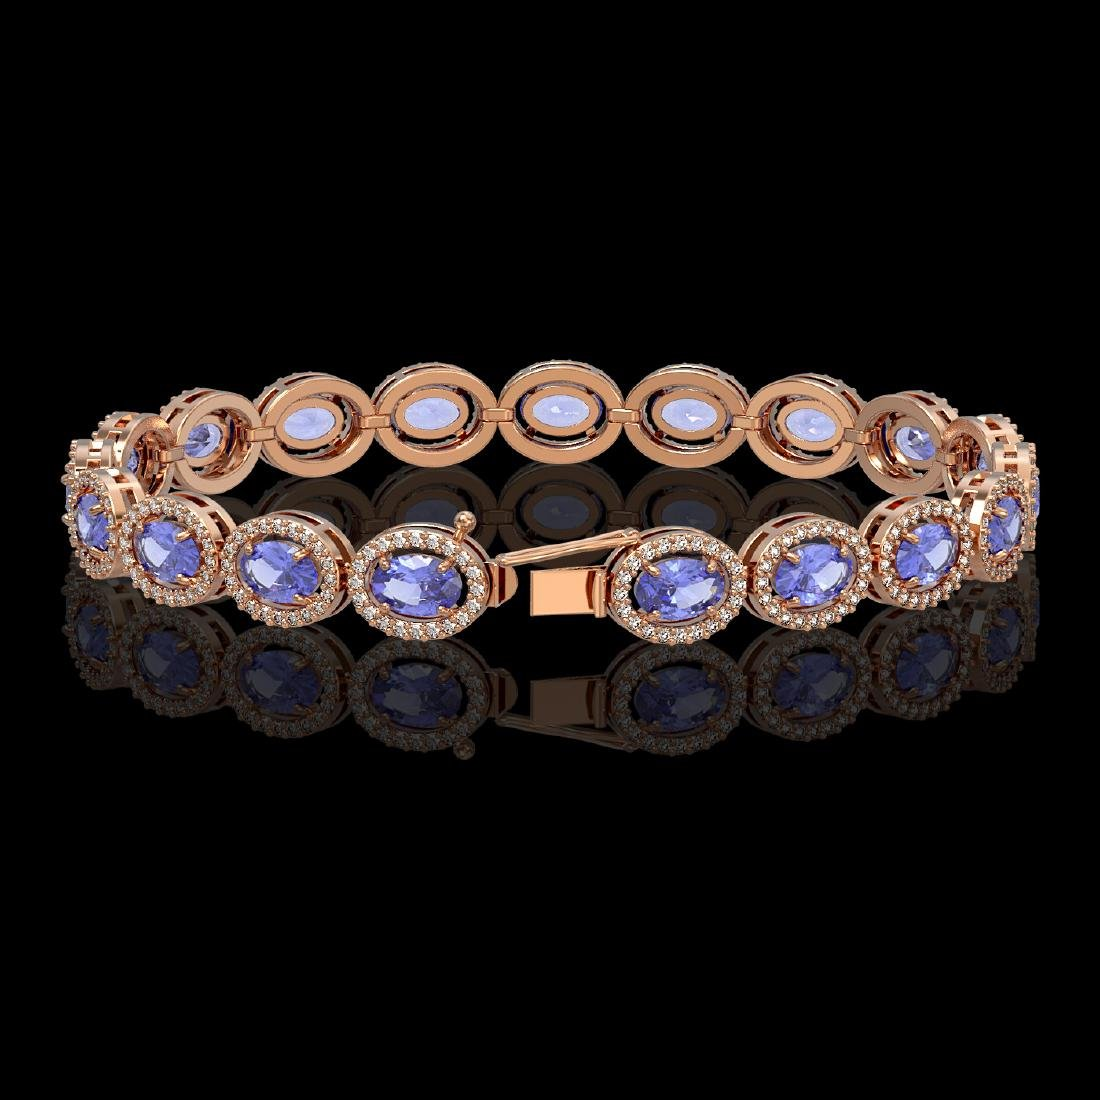 14.25 CTW Tanzanite & Diamond Halo Bracelet 10K Rose - 2